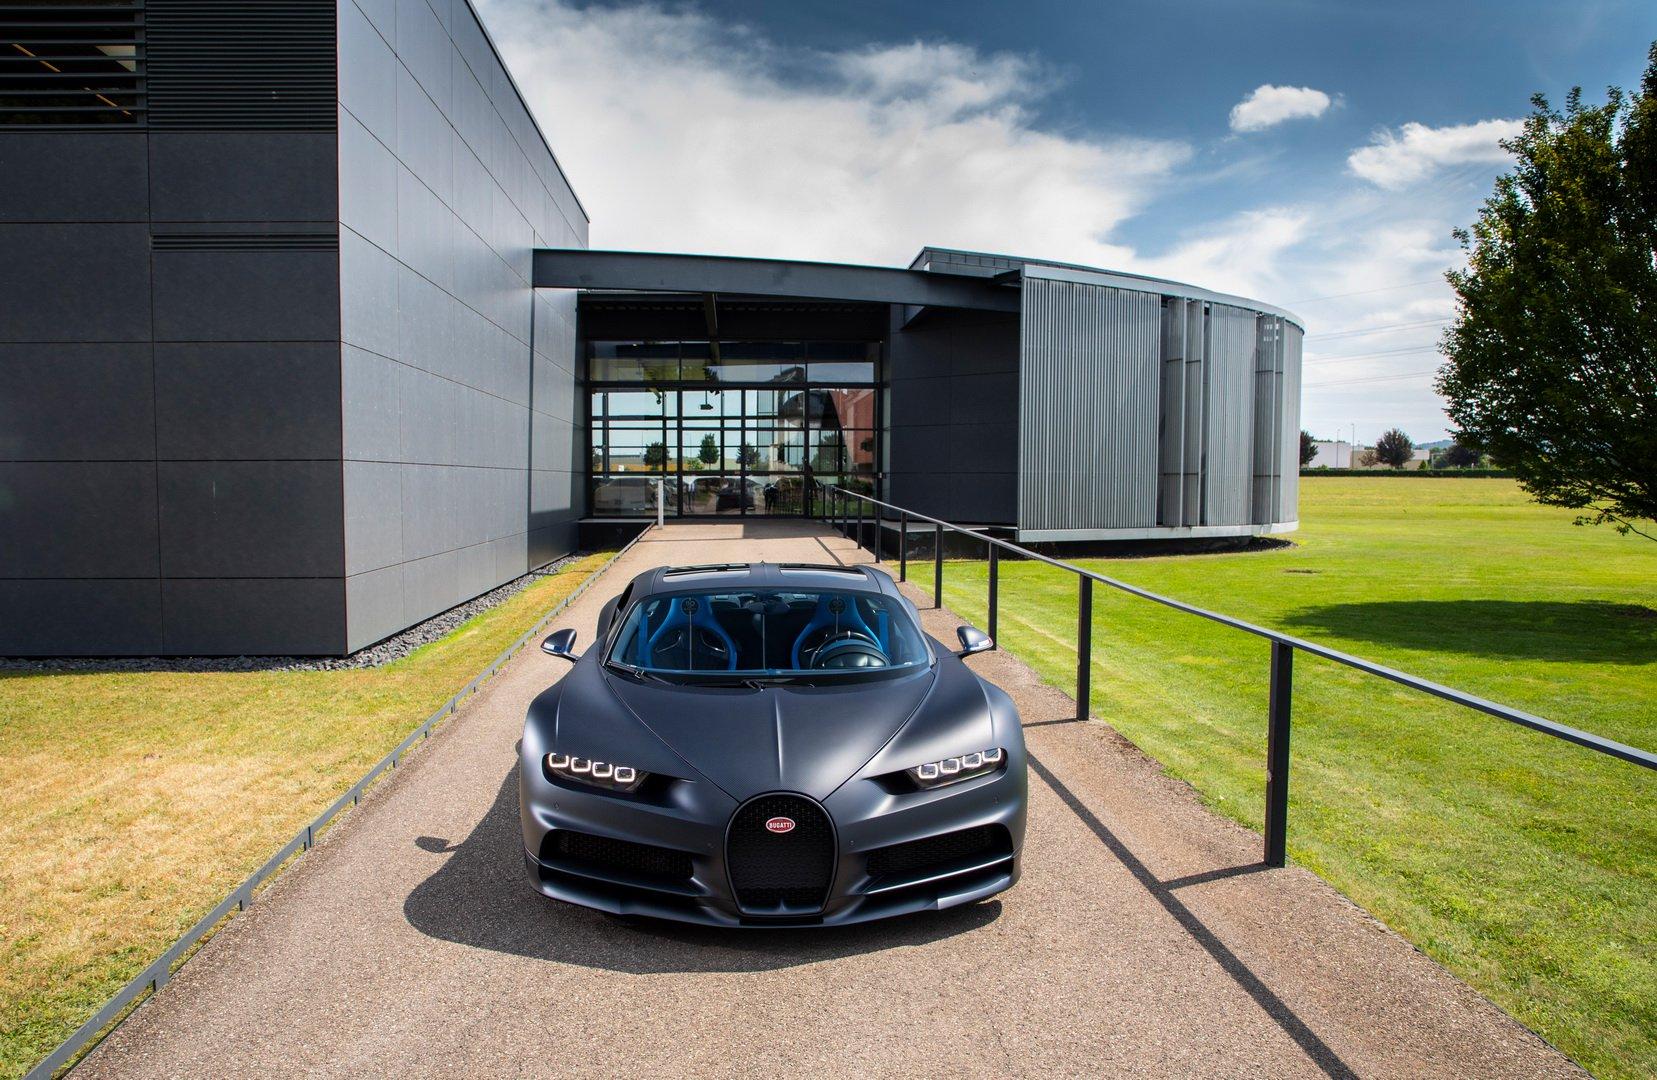 Bugatti-Chiron-Sport-110-Ans-Bugatti-production-plant-40